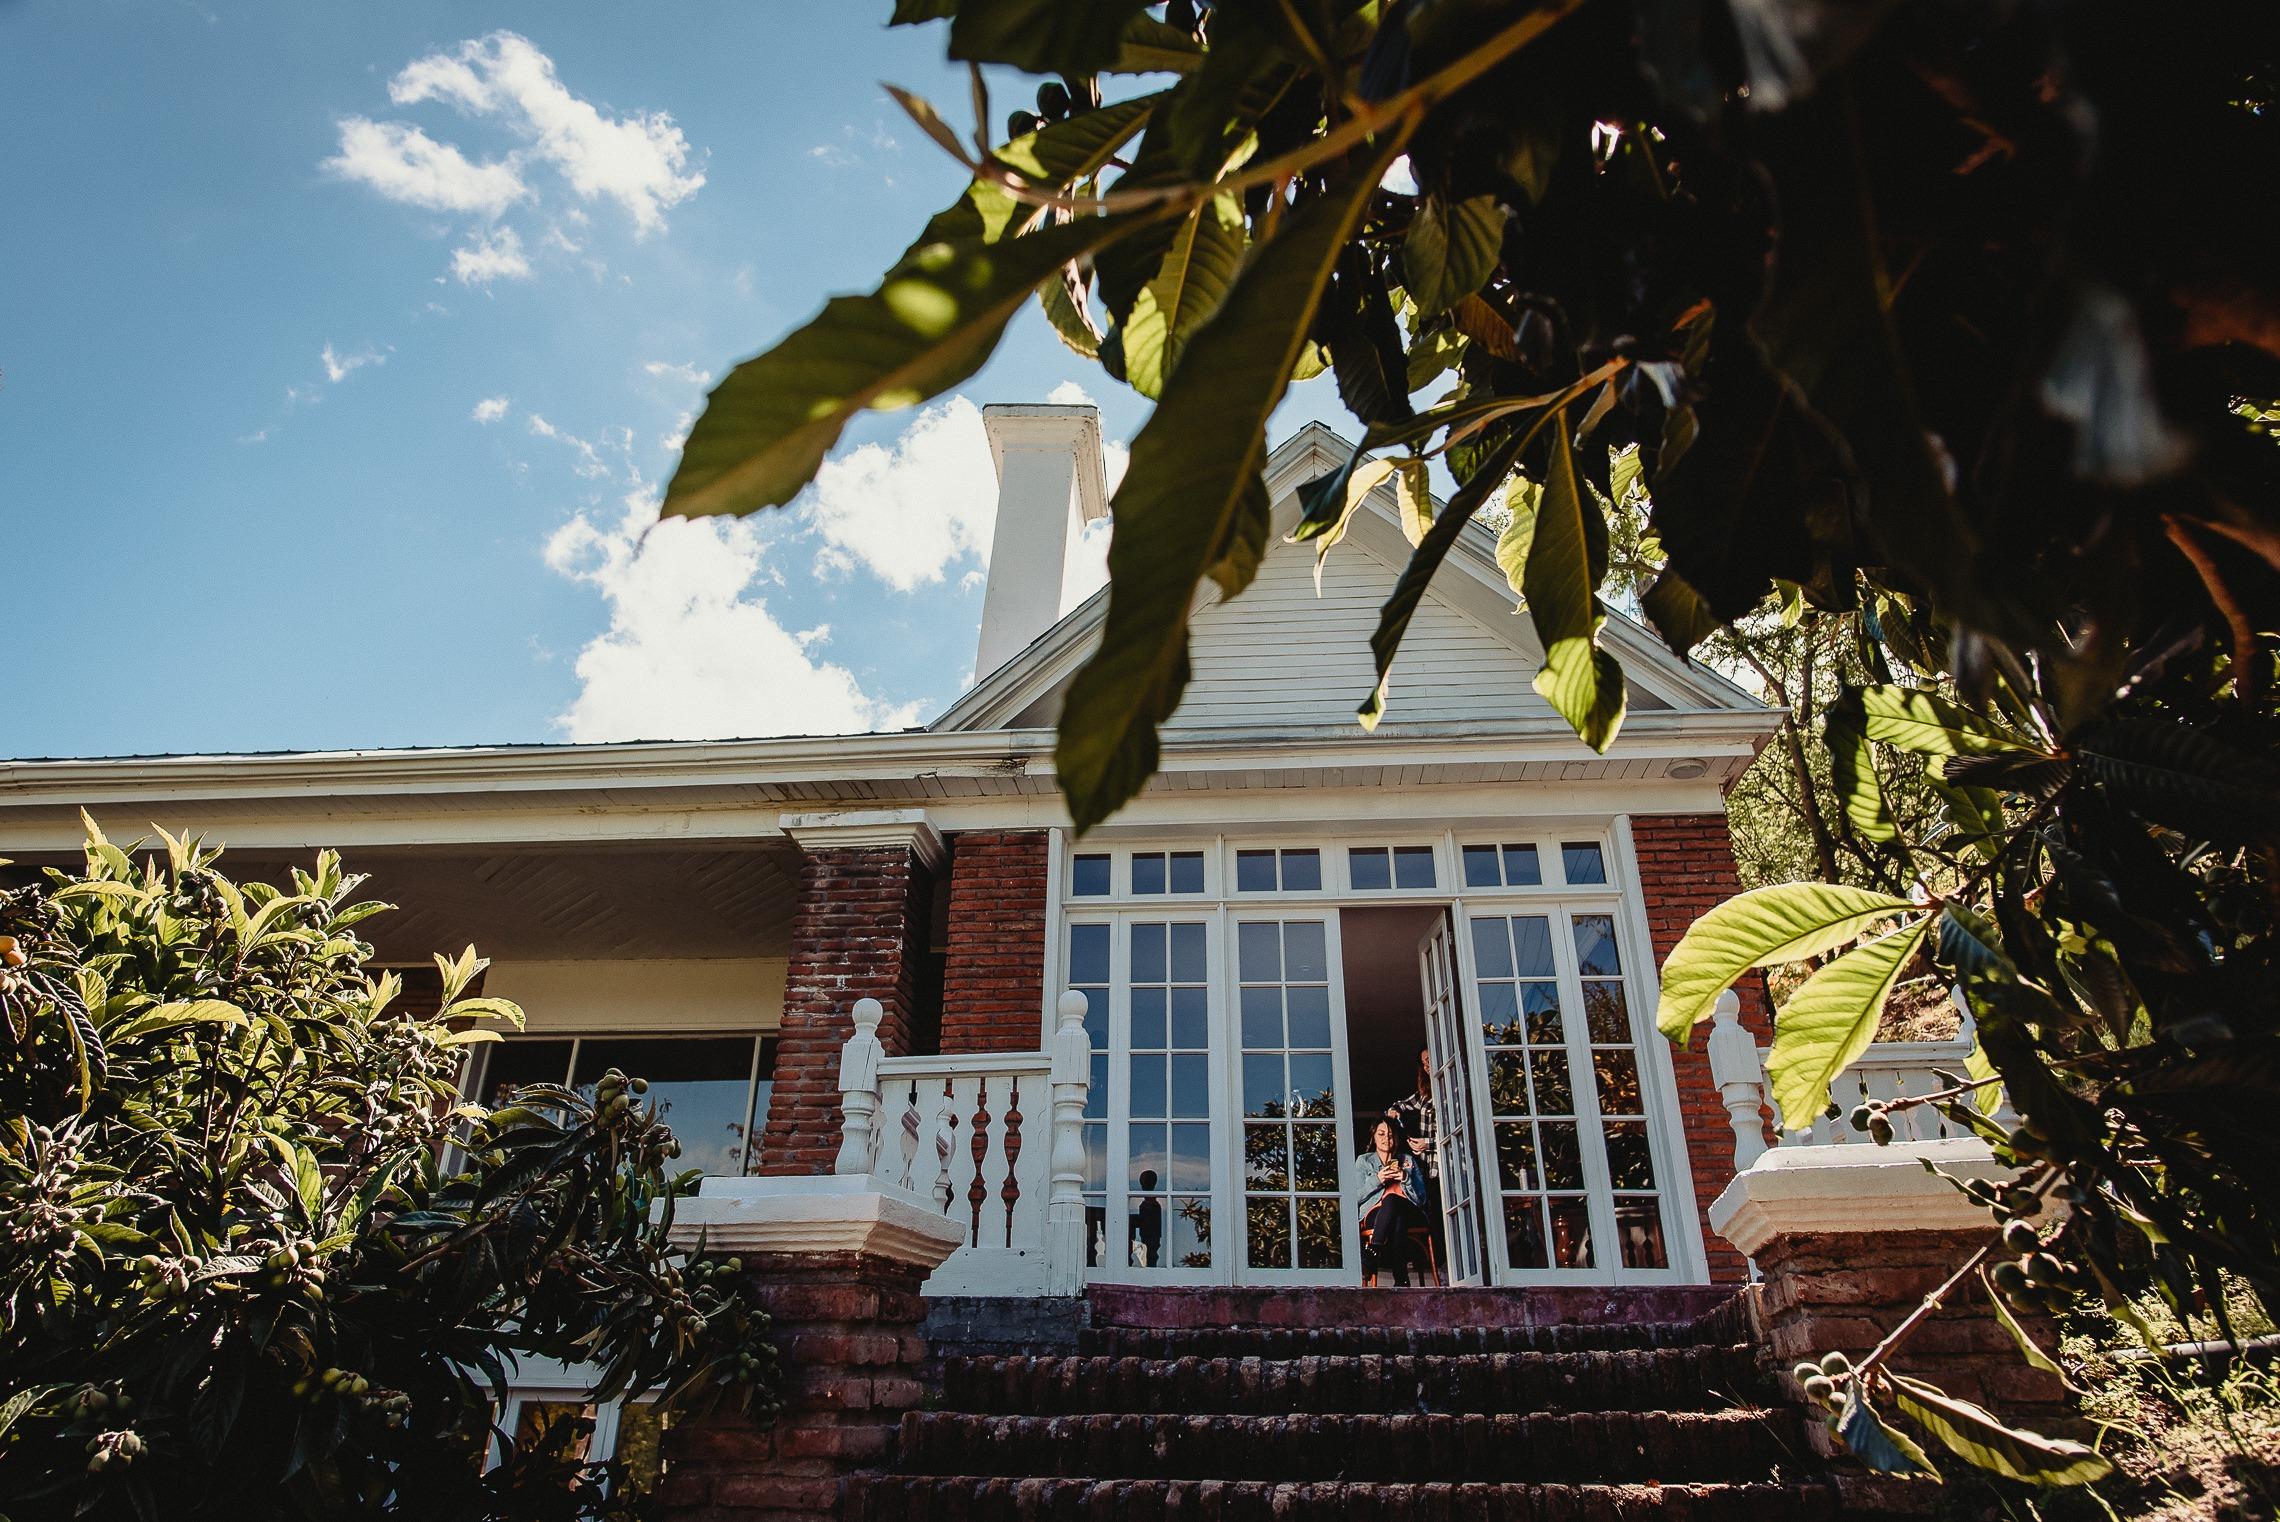 Matrimonio Simbolico Chile : Fotografías del matrimonio de pili y chona en altos paico